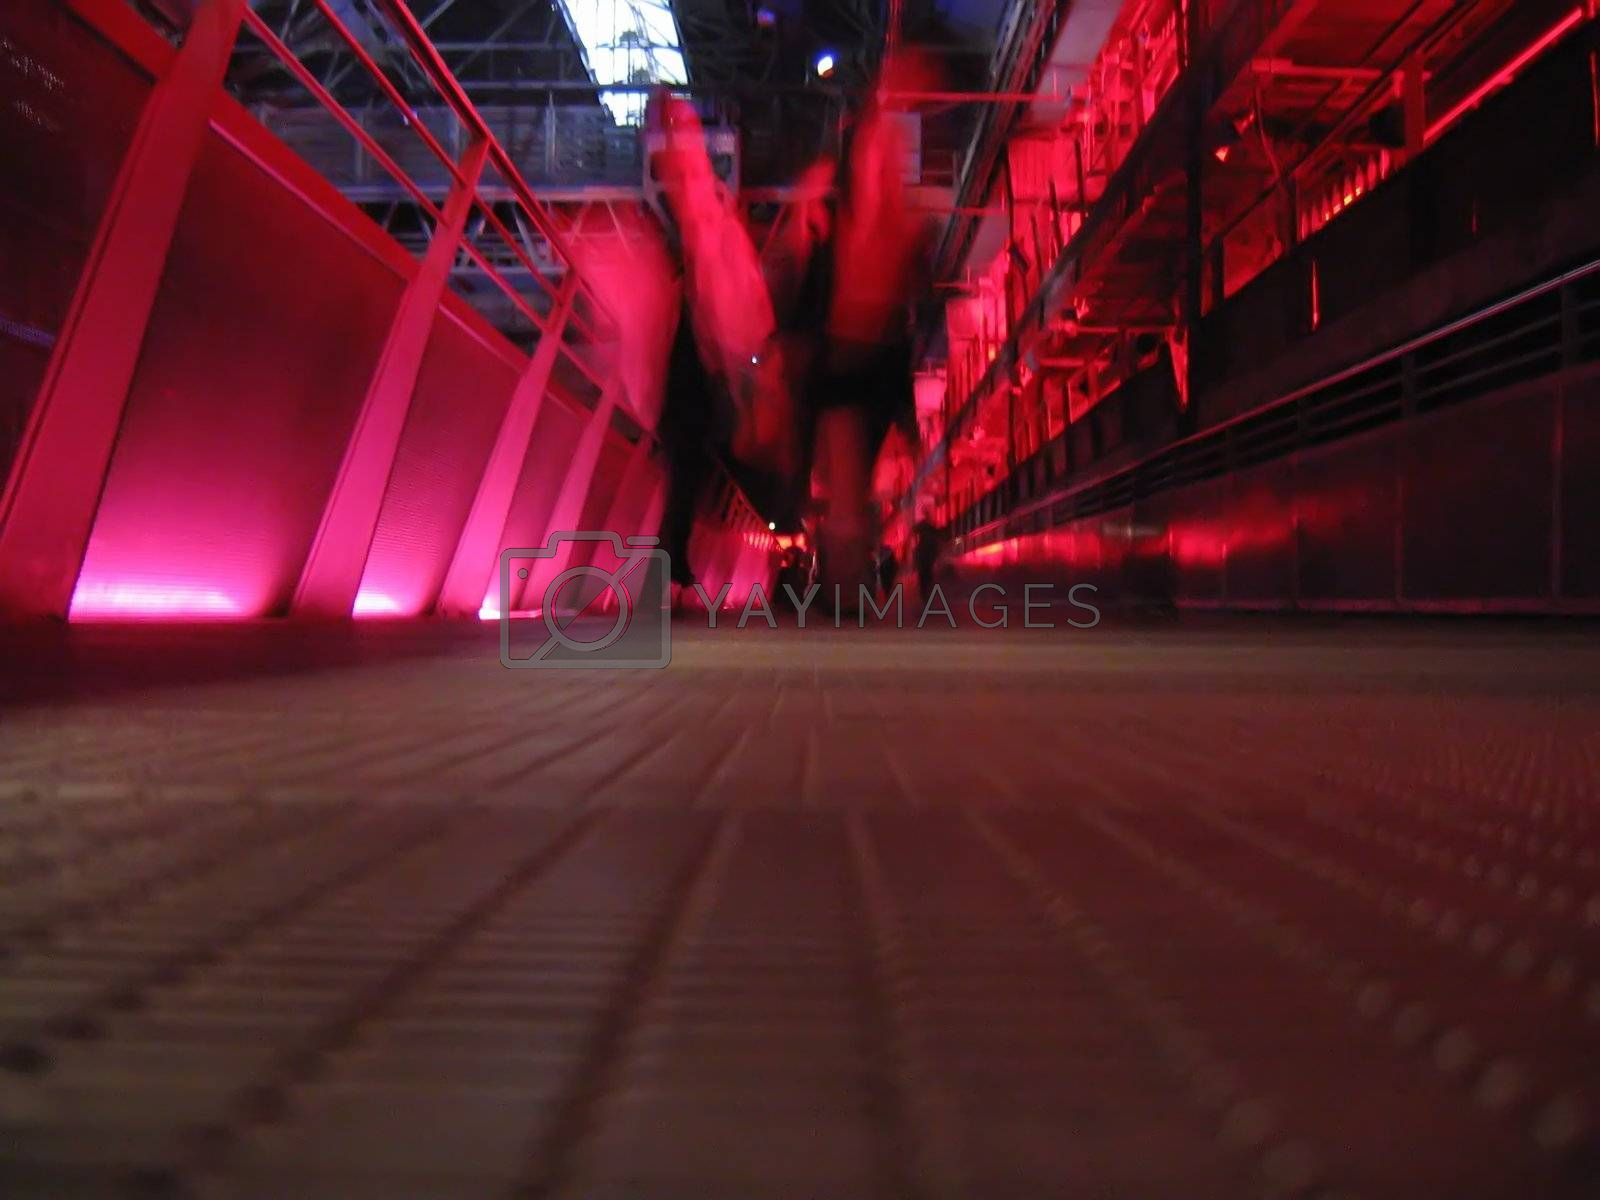 Red Walkway in Big Factory